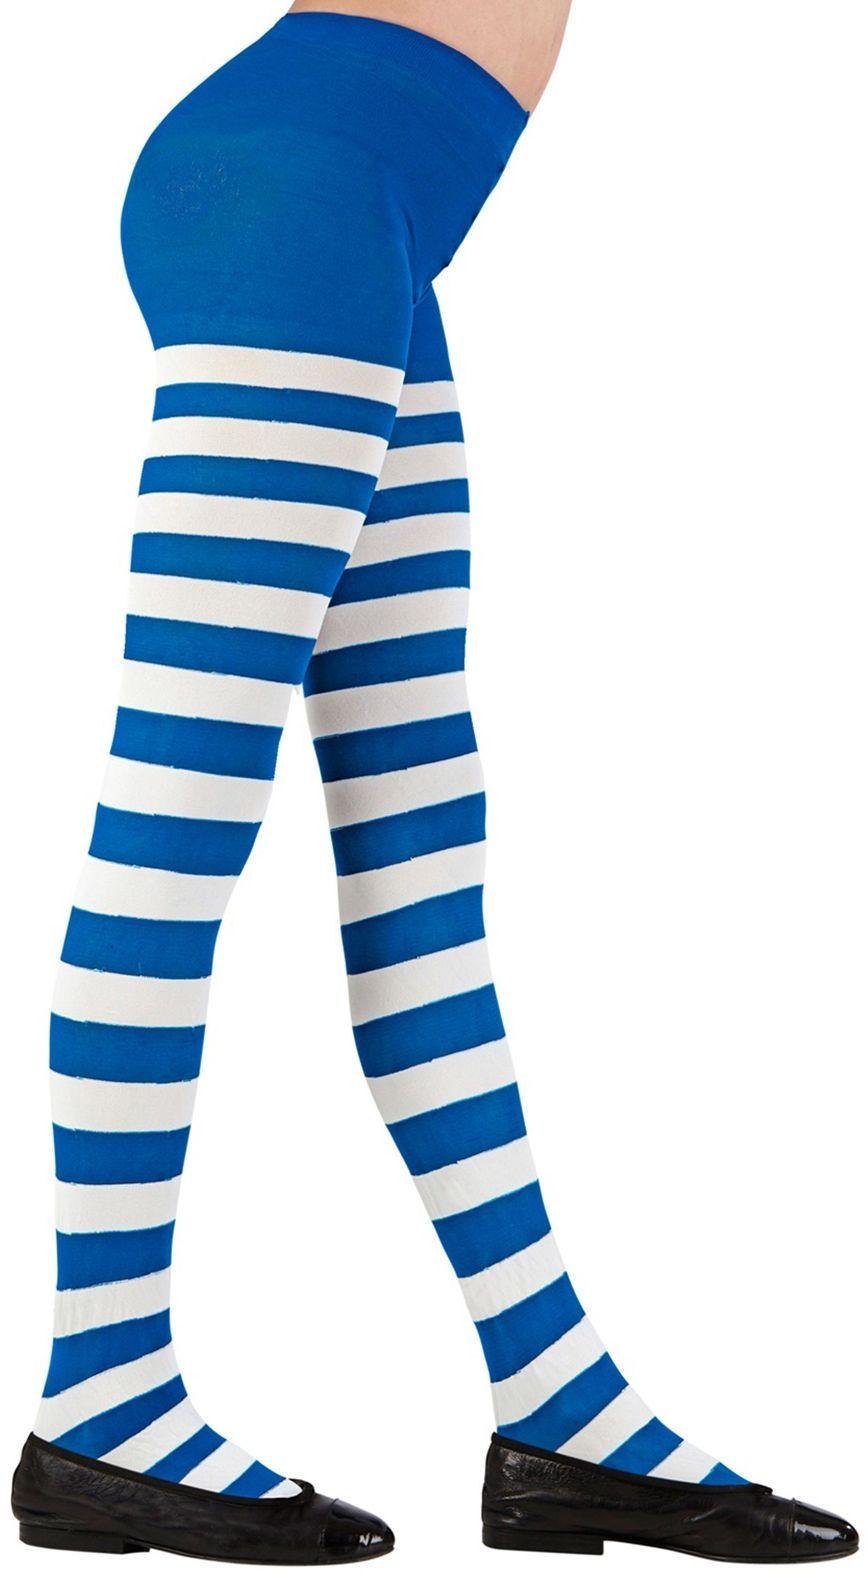 Wit blauw gestreepte kinderpanty